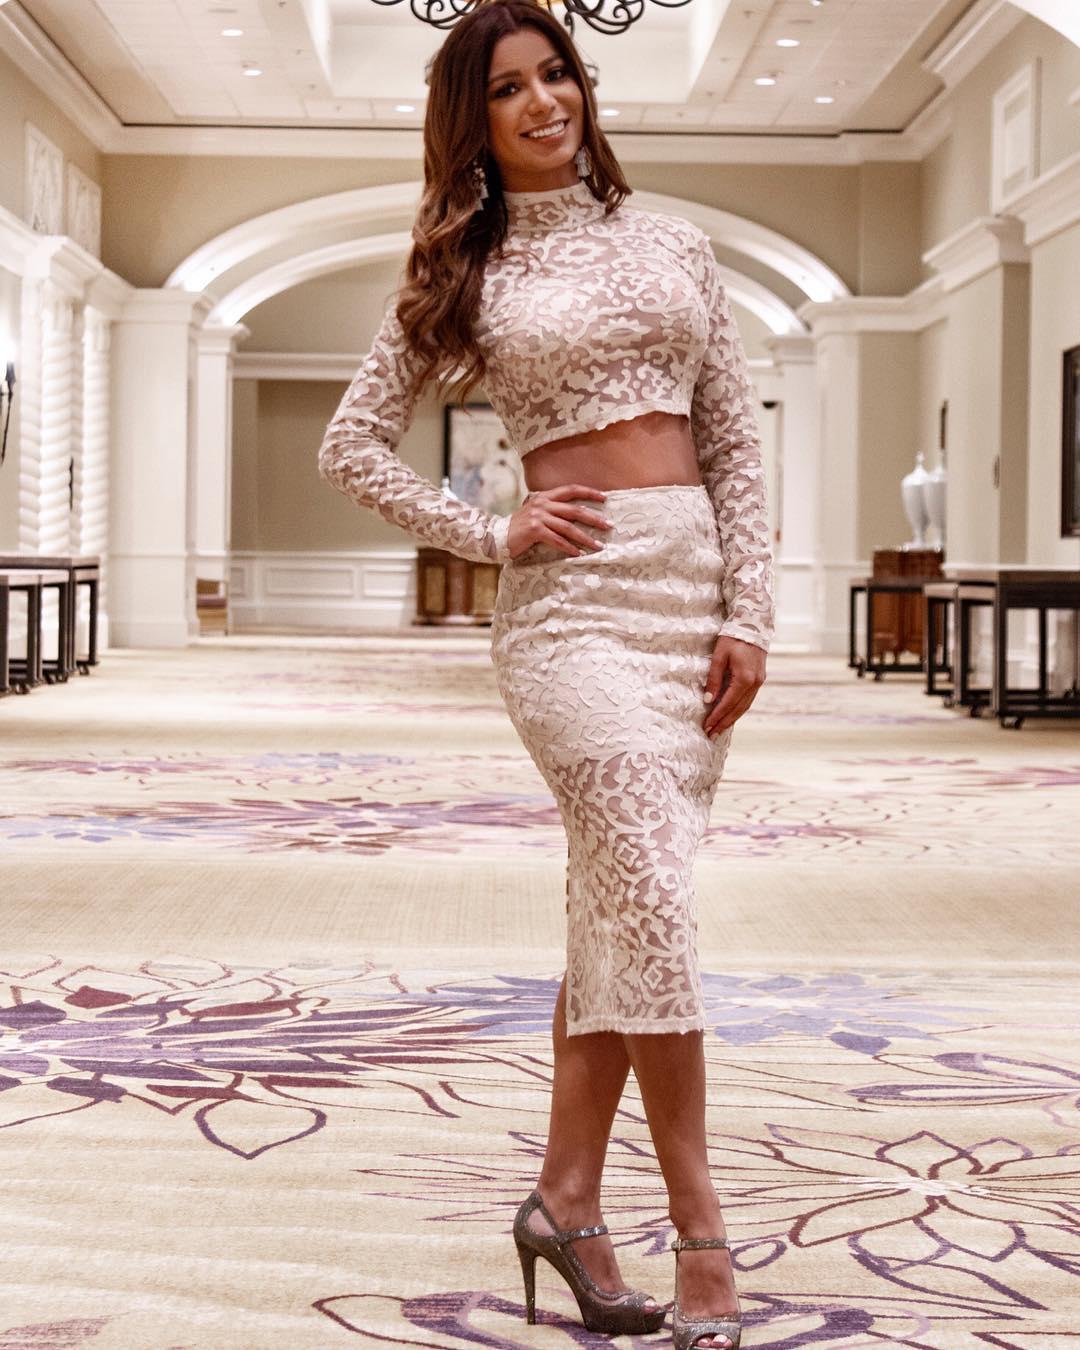 geraldine chaparro, miss usa hispanoamericana 2018/miss mundo latina turismo usa 2018. - Página 2 37762110